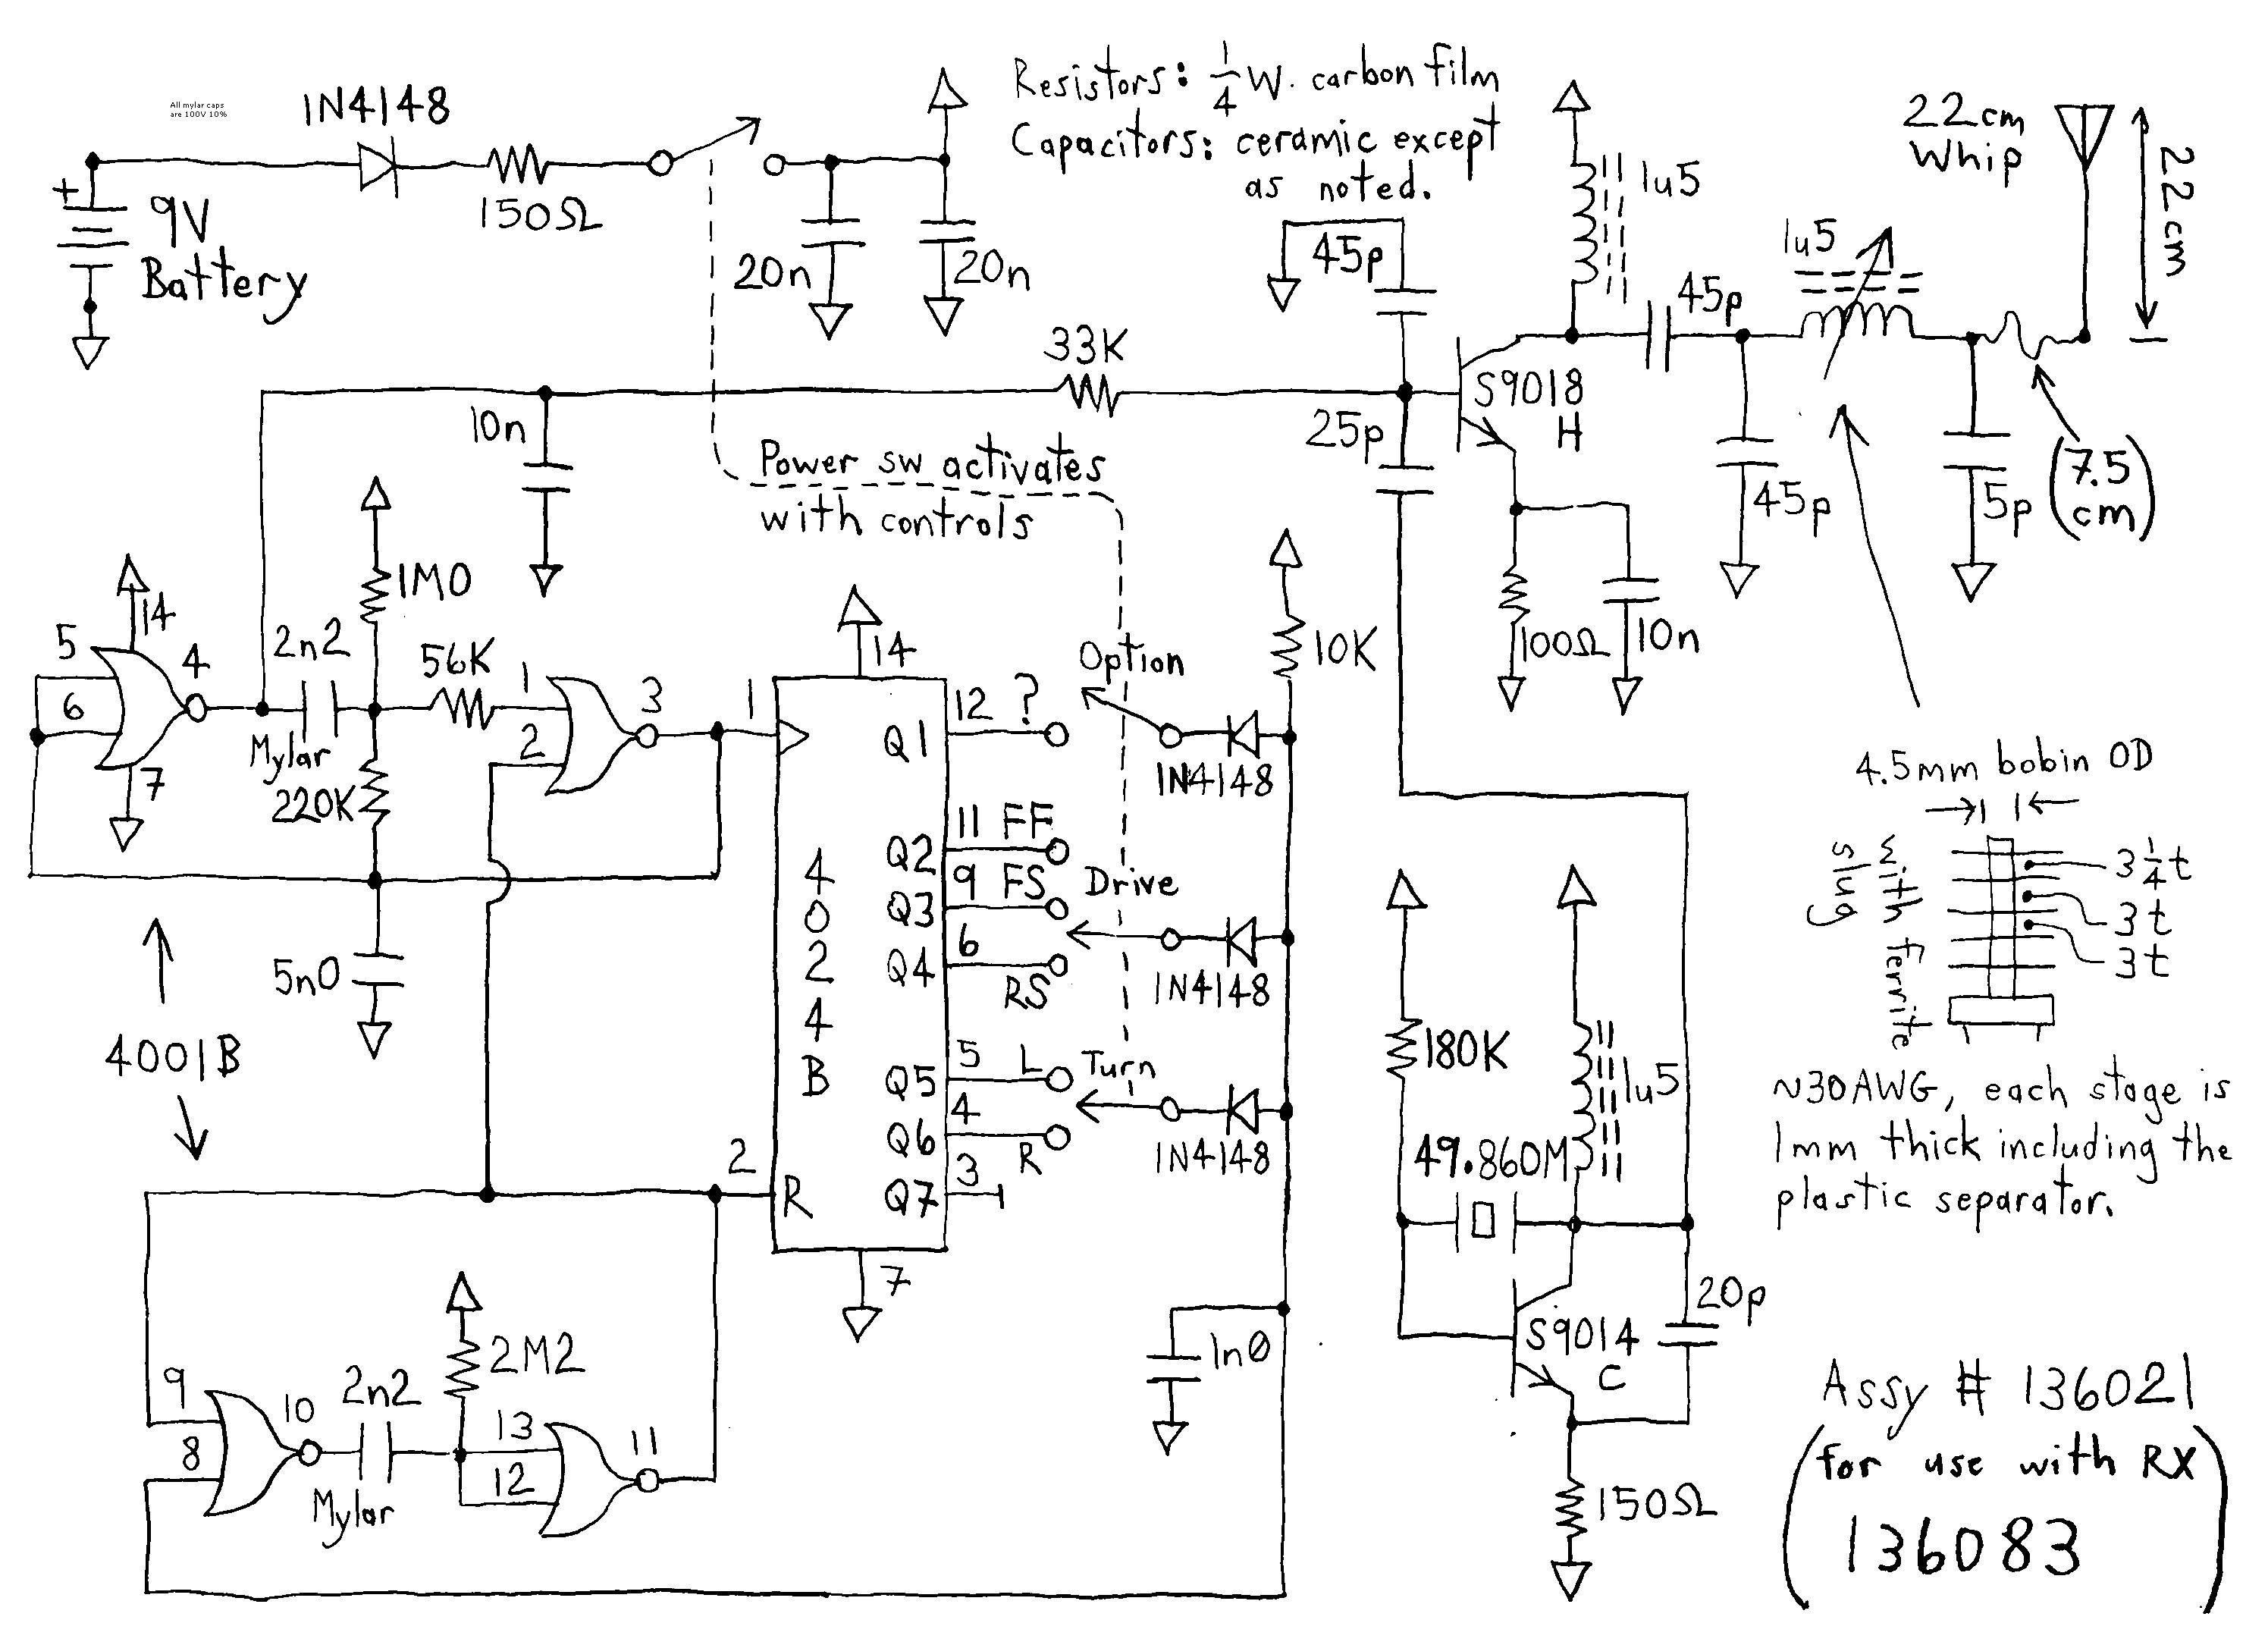 Simple Car Diagram European Wiring Diagram Symbols Save Simple Wiring Diagram Symbols Of Simple Car Diagram